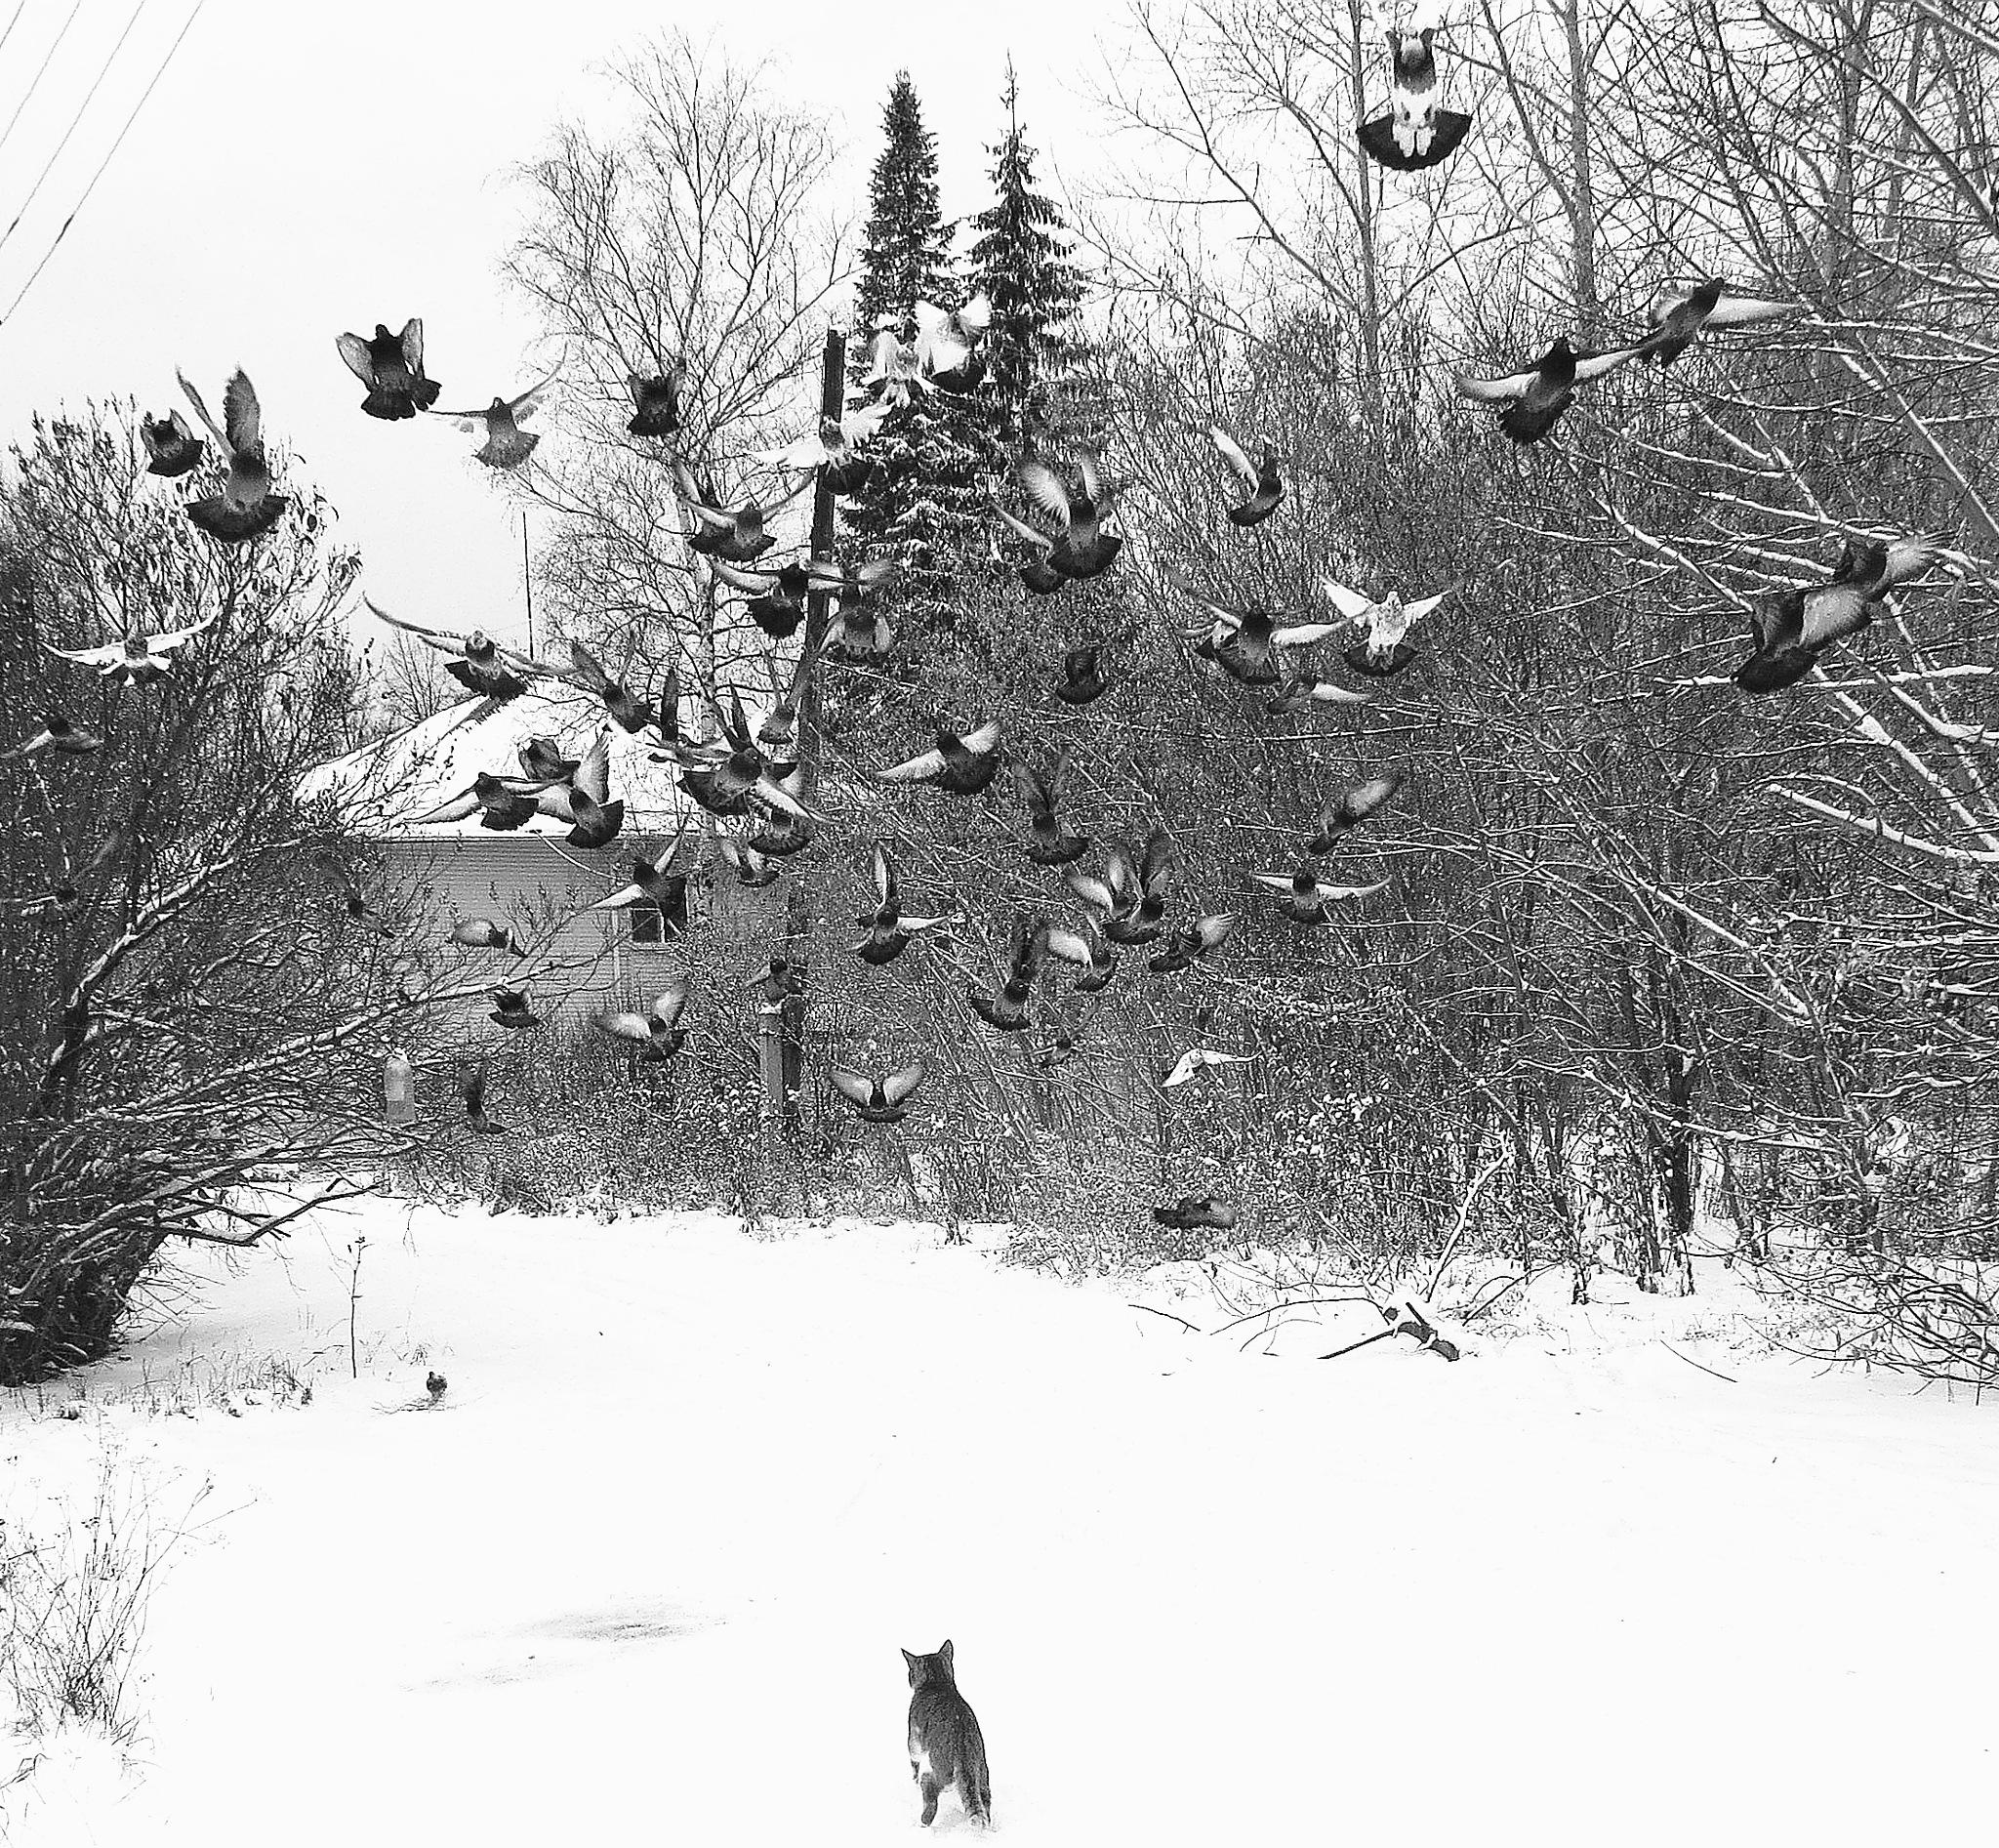 Flight of Pigeons by sergey.parfeniuk